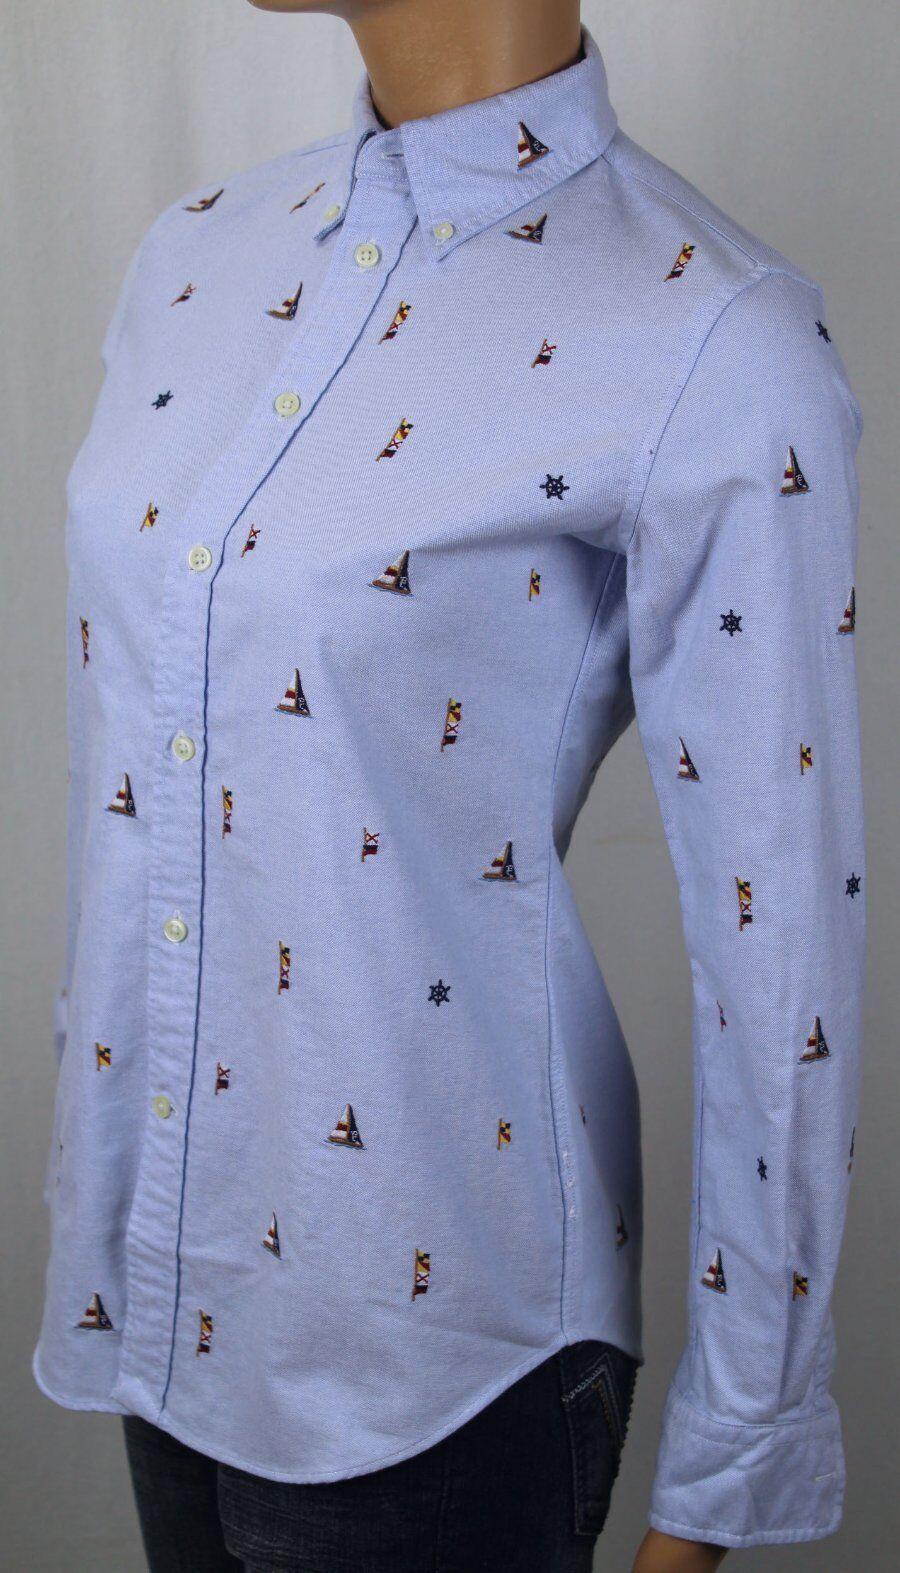 Ralph Lauren Langärmlig Blau Oxford Seemanns SegelStiefel Enge Passform Blause Hemd